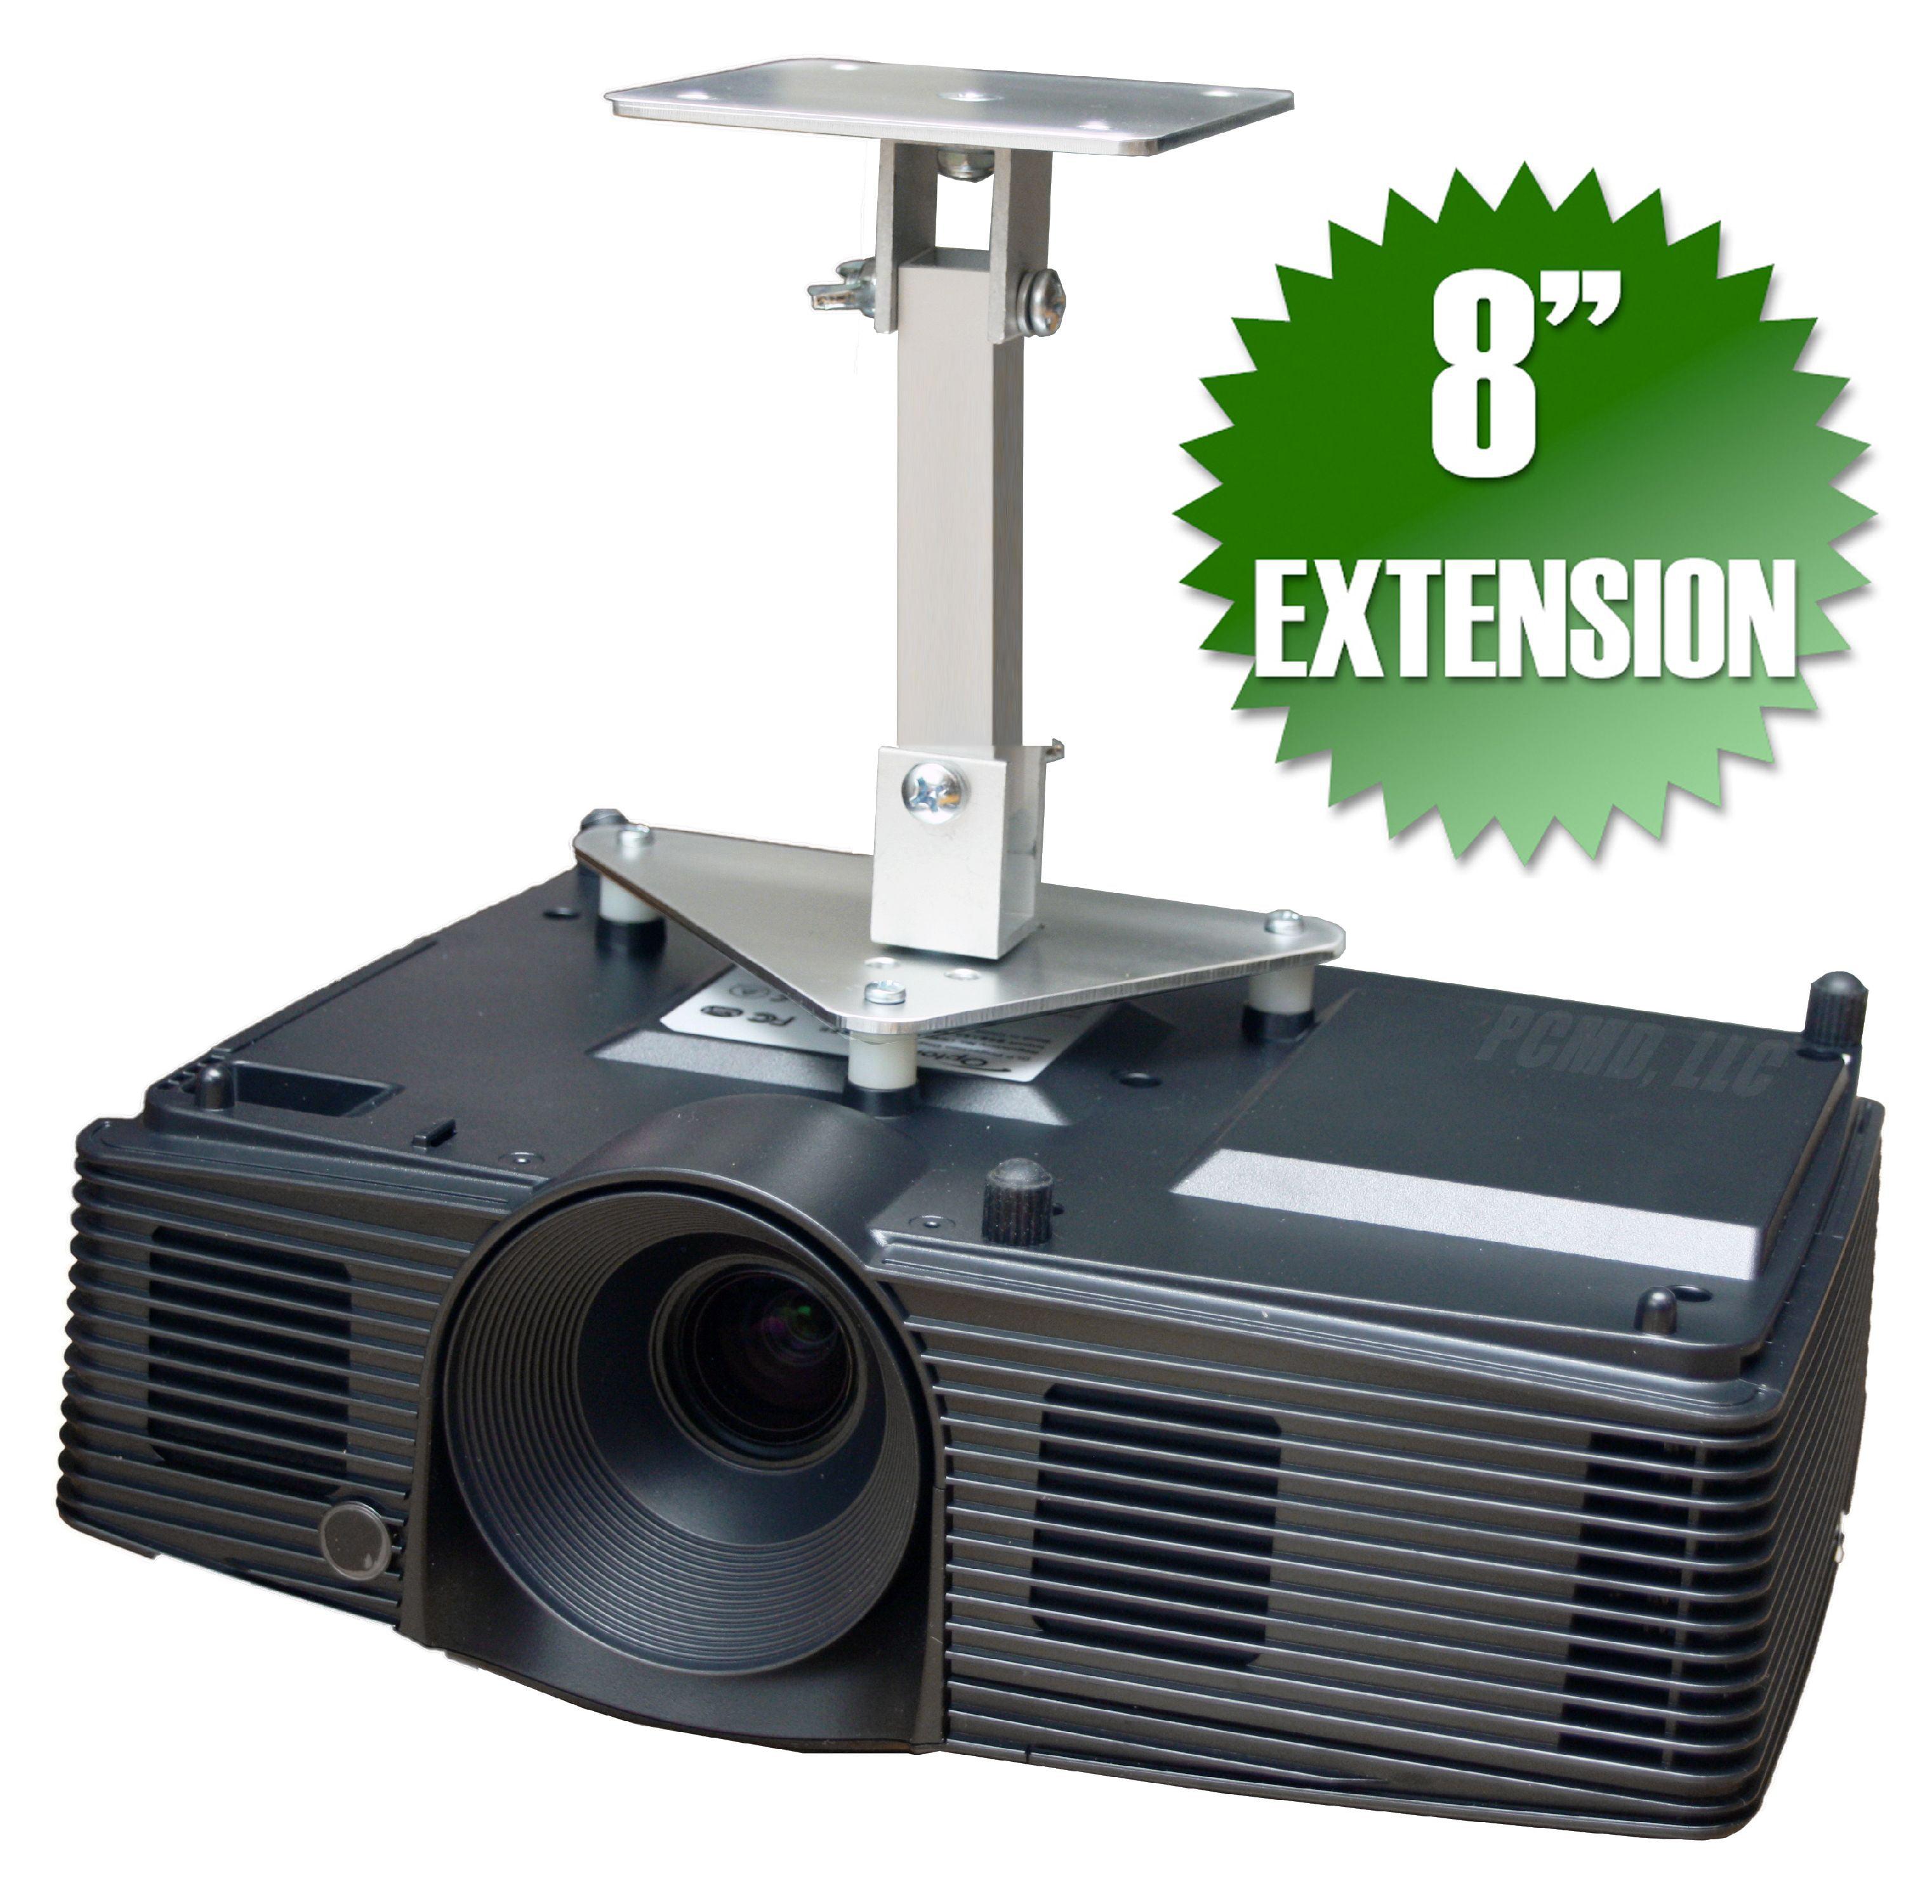 Projector Ceiling Mount for ViewSonic PJD5151 PJD5153 PJD5155 PJD5250 PJD5253